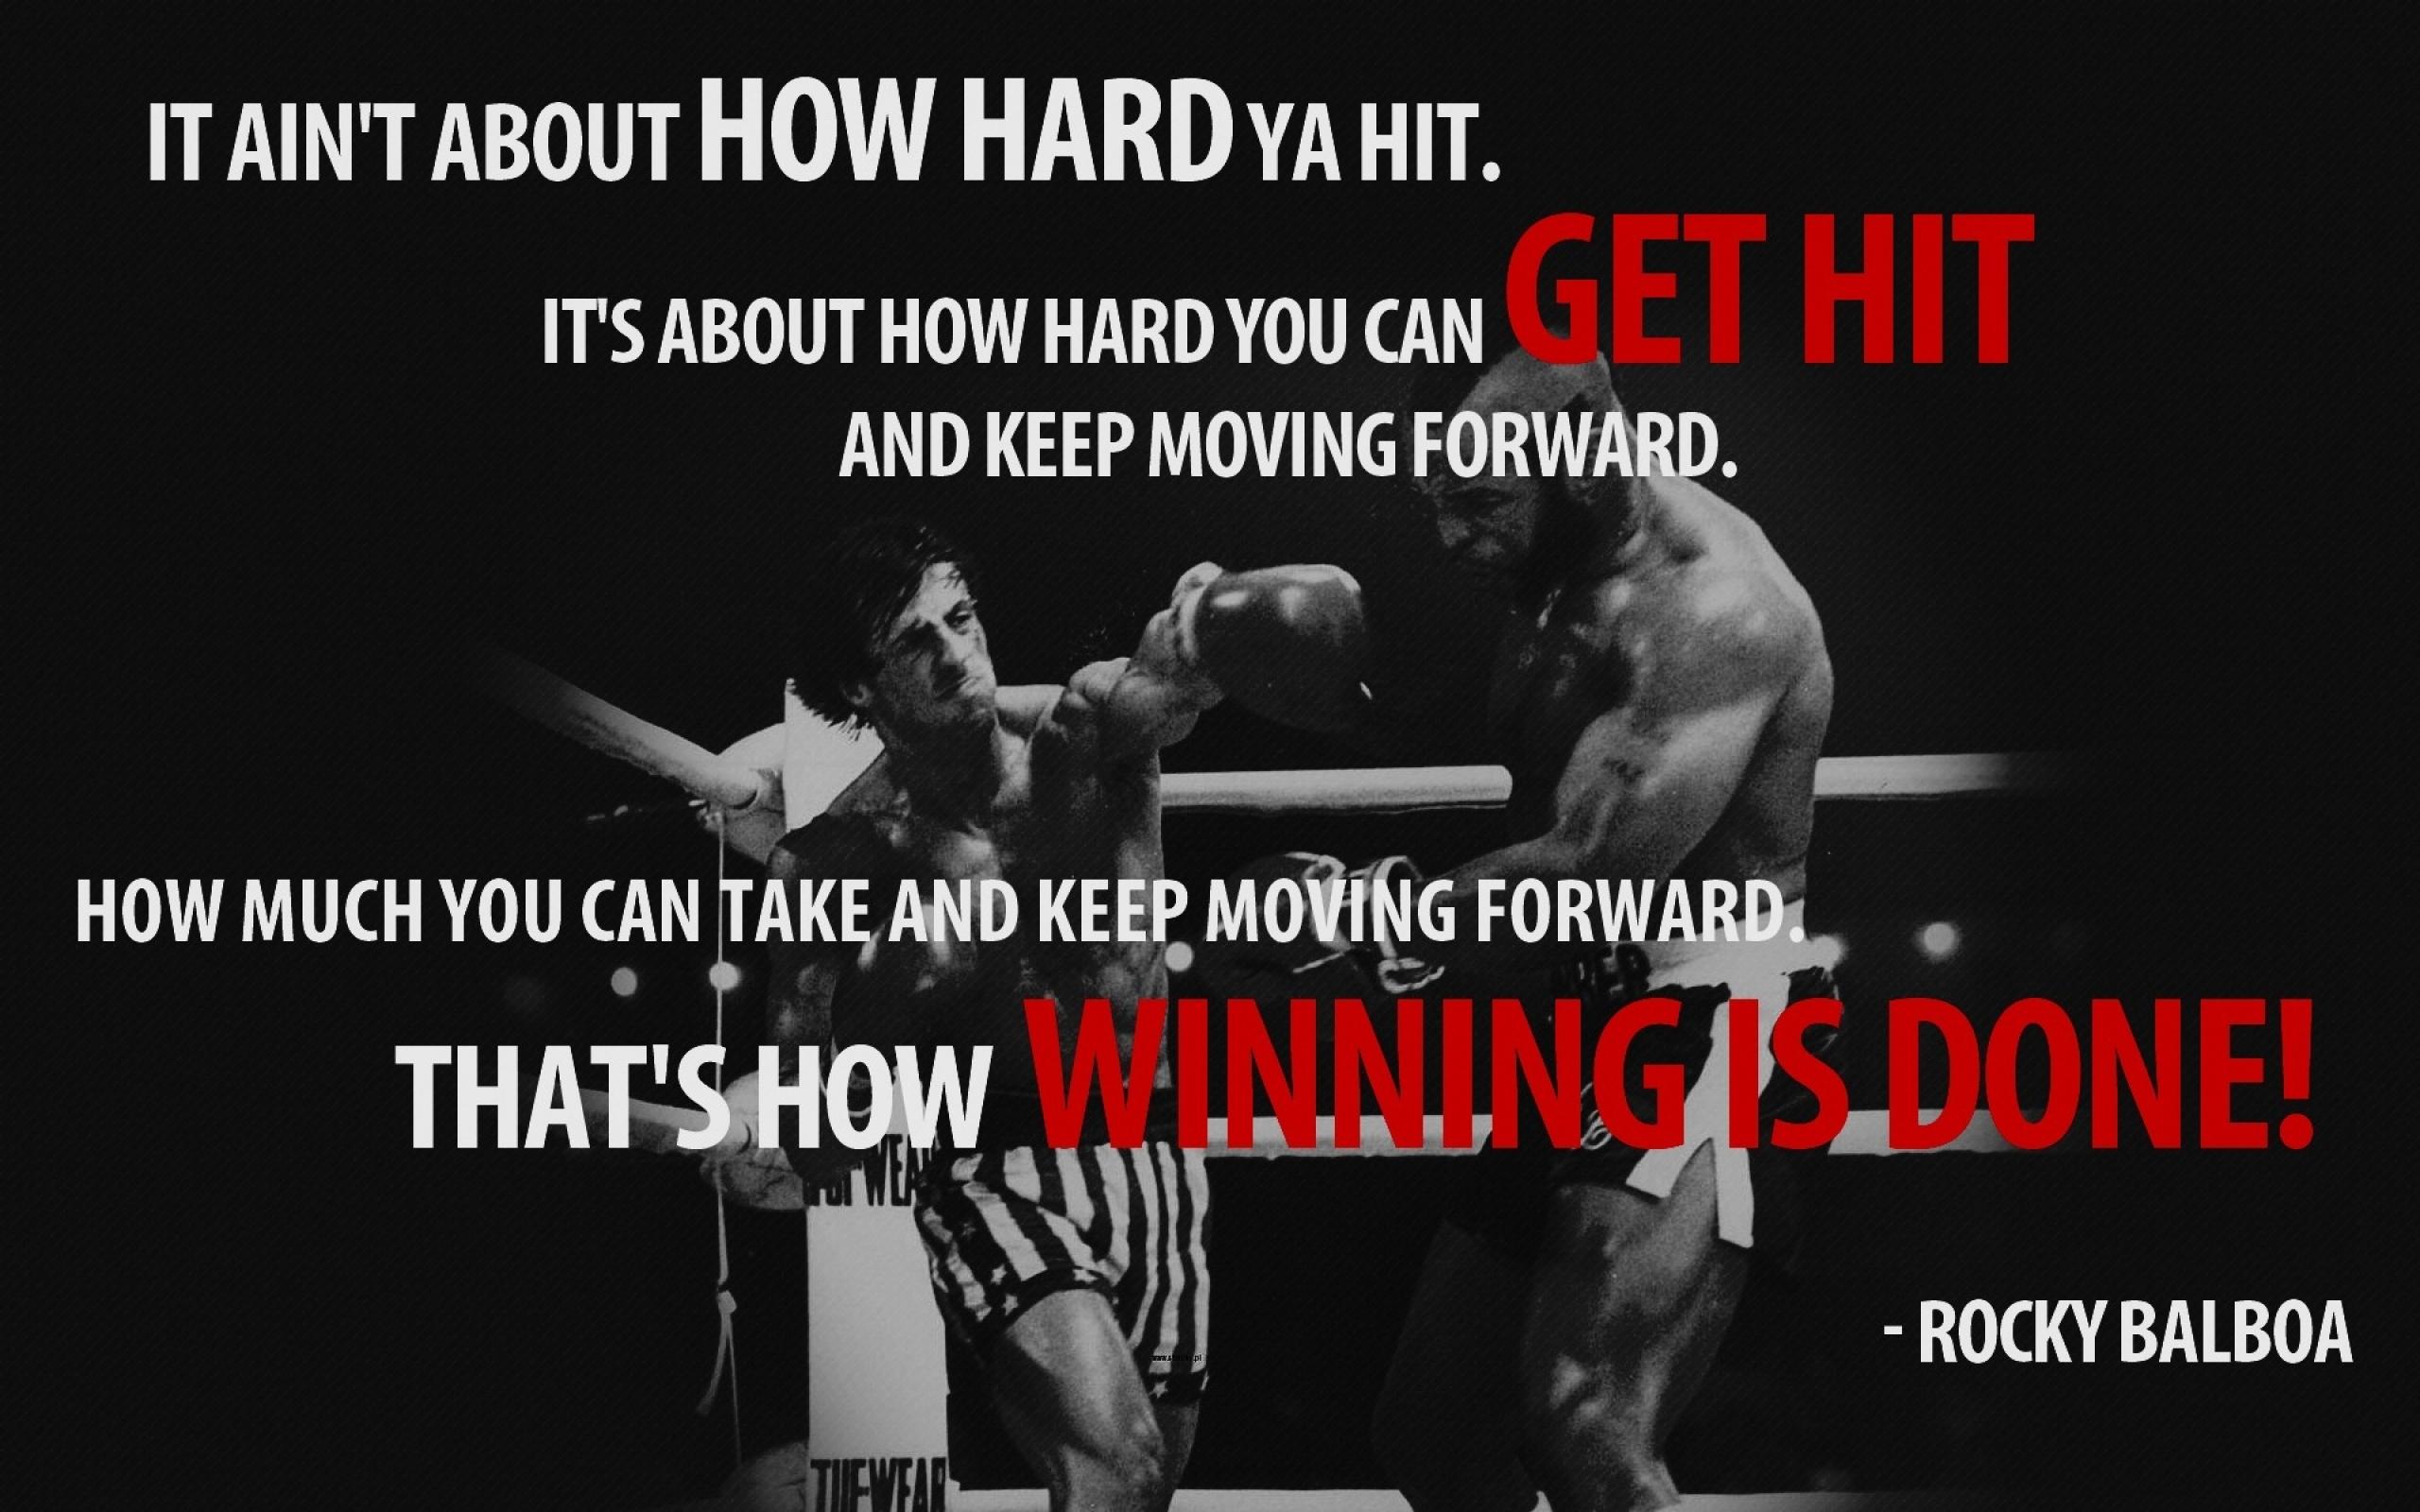 rocky balboa rocky the movie motivation 1920x1200 wallpaper Art HD 2560x1600